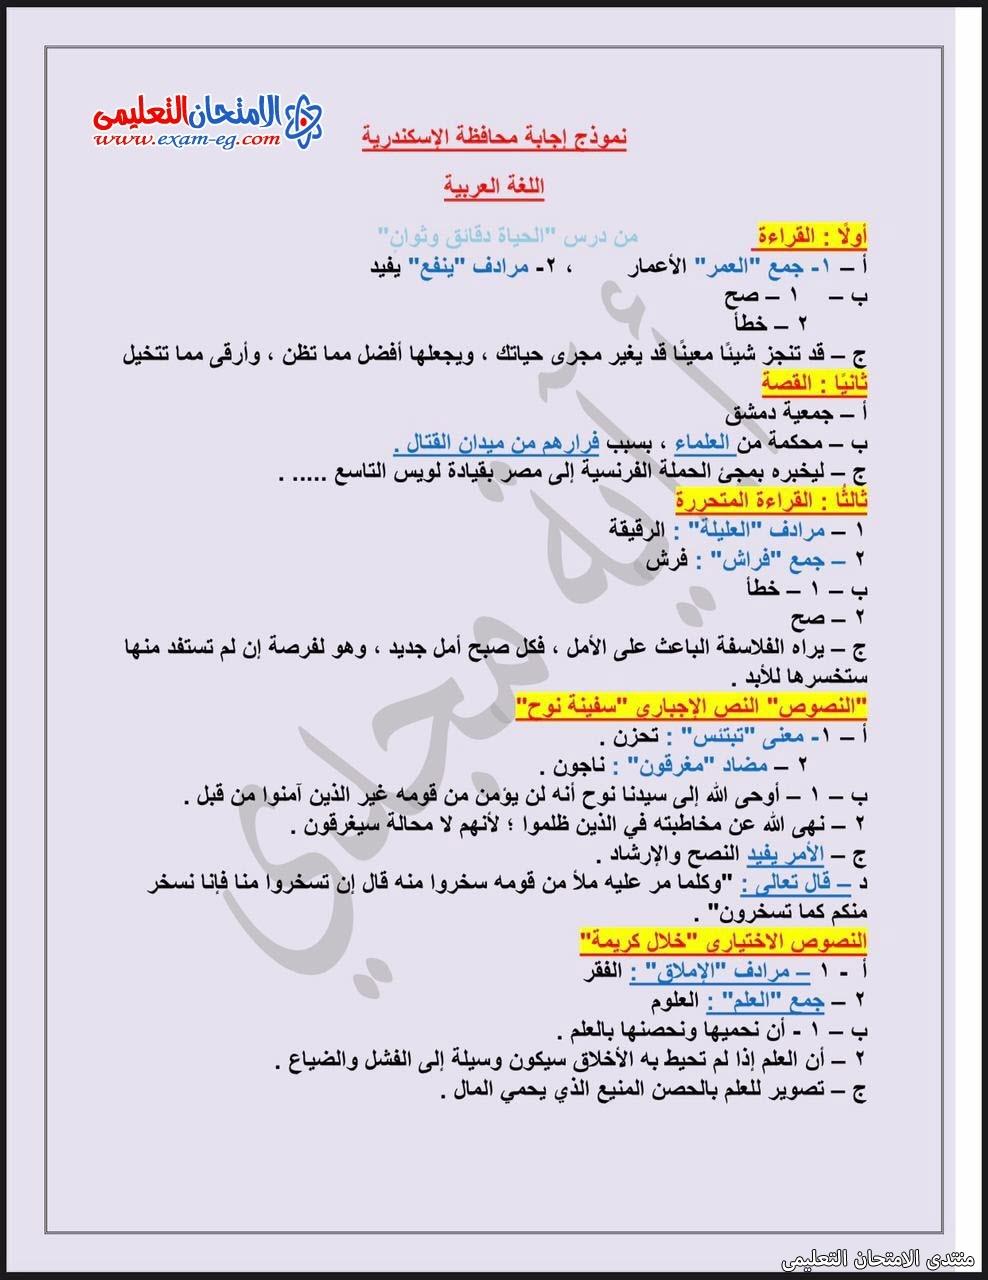 exam-eg.com_162288844741243.jpg